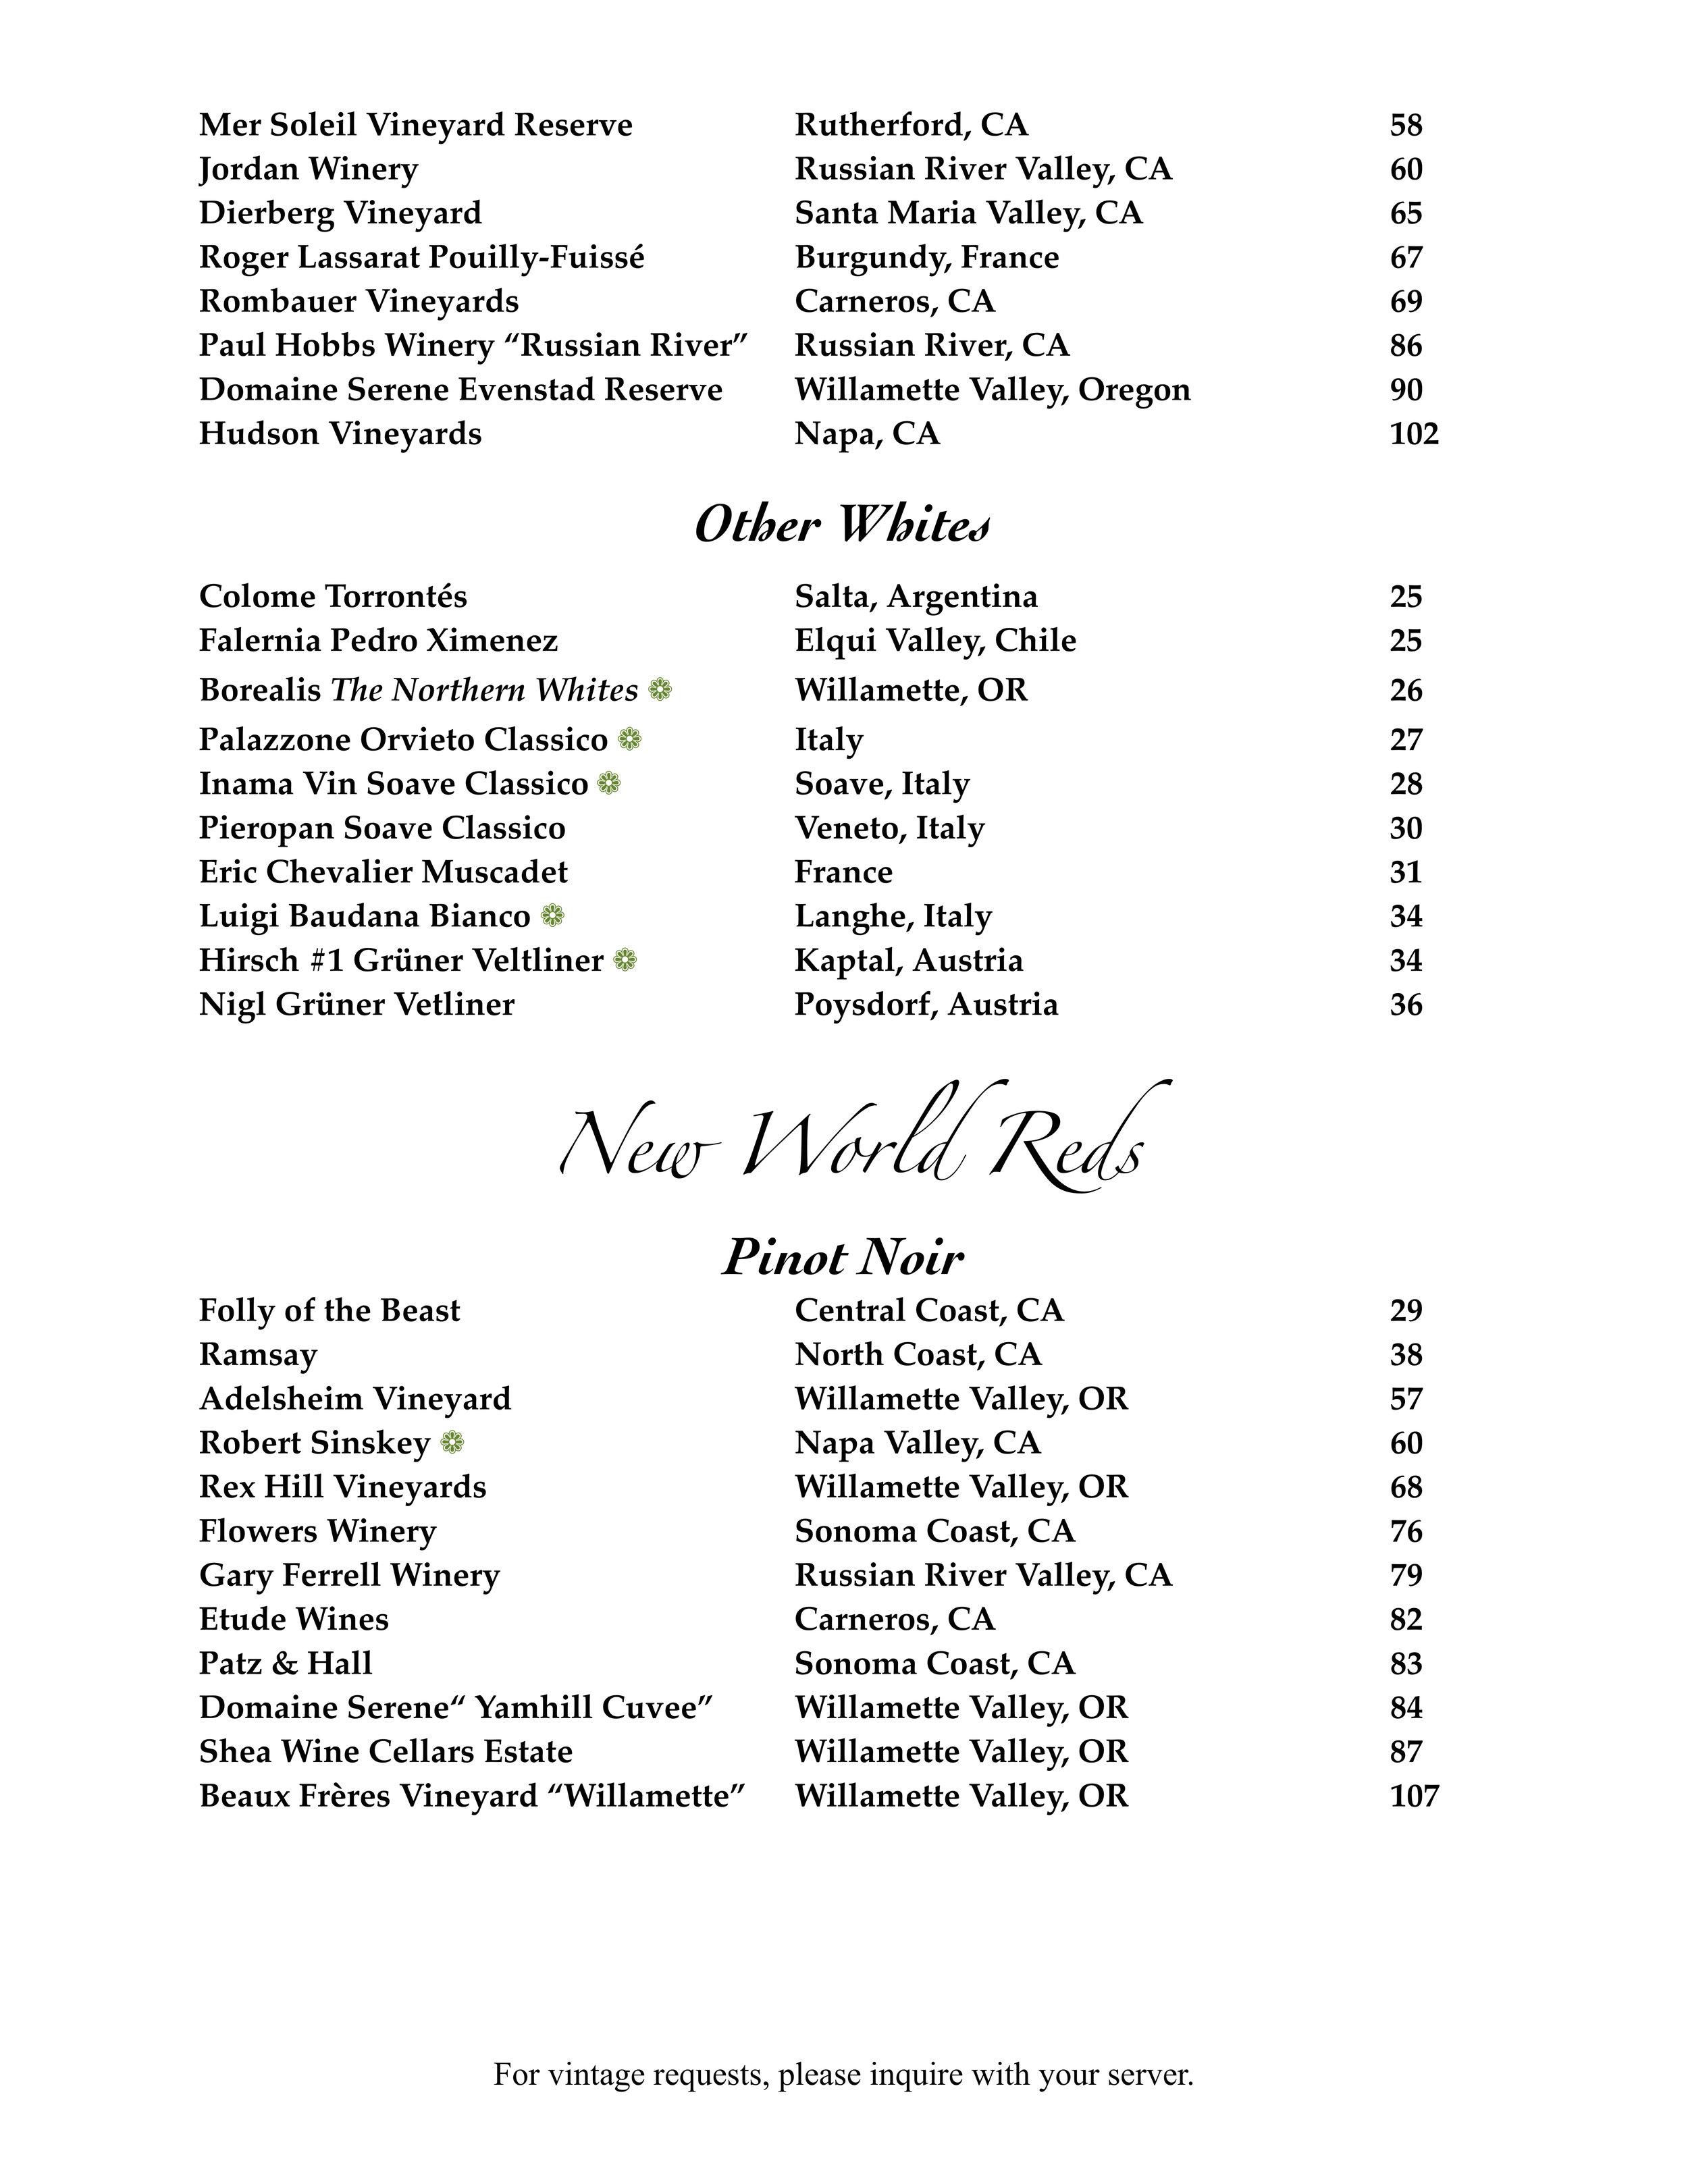 website wine list 3.jpg